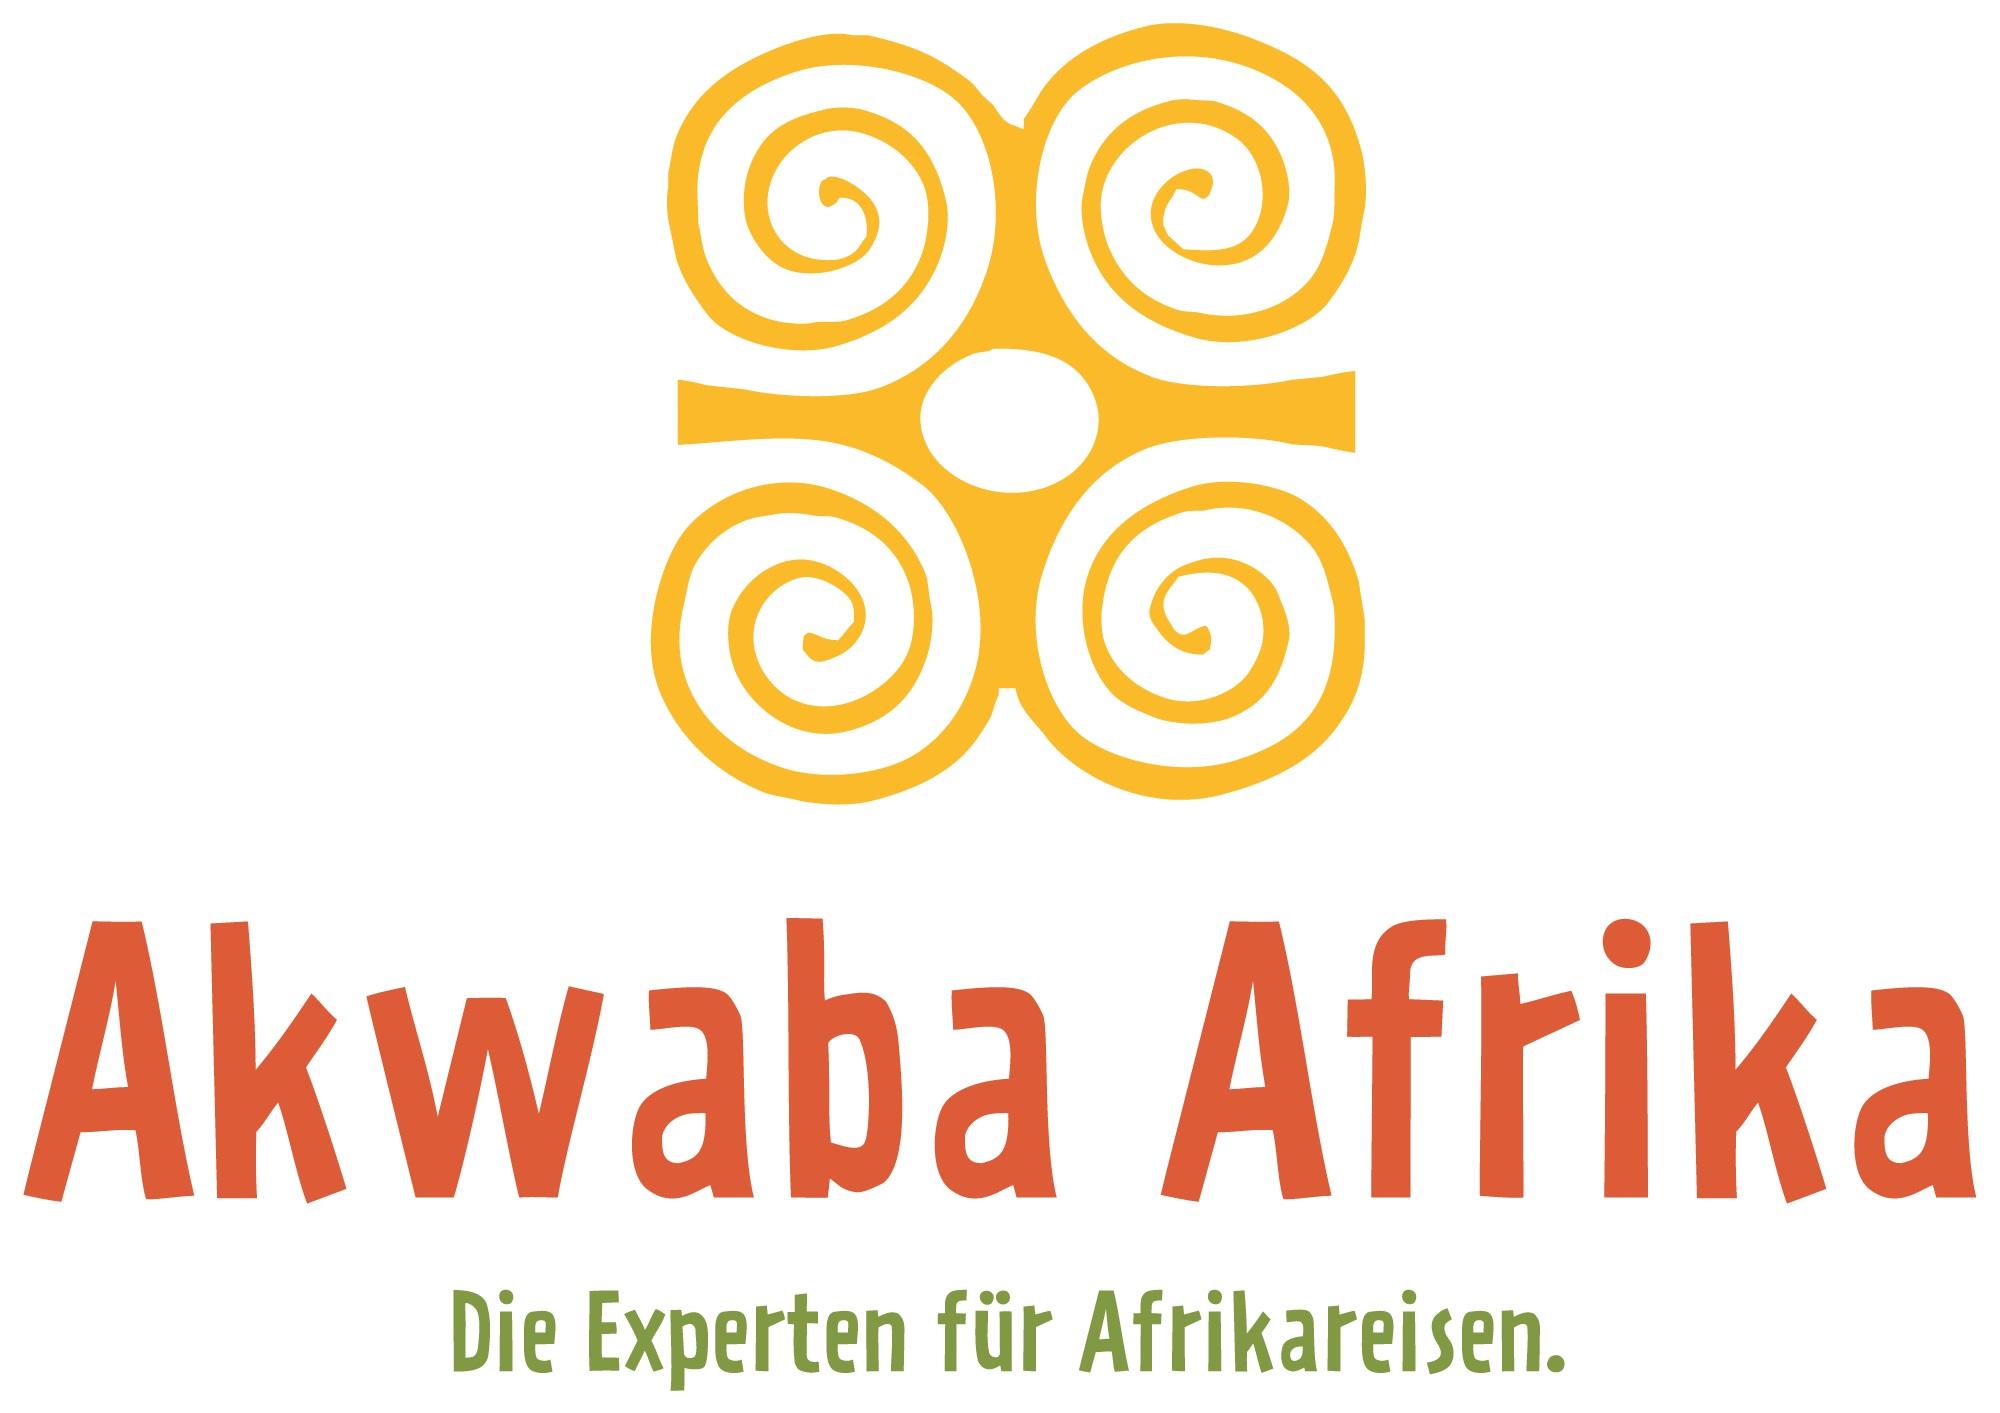 Akwaba,